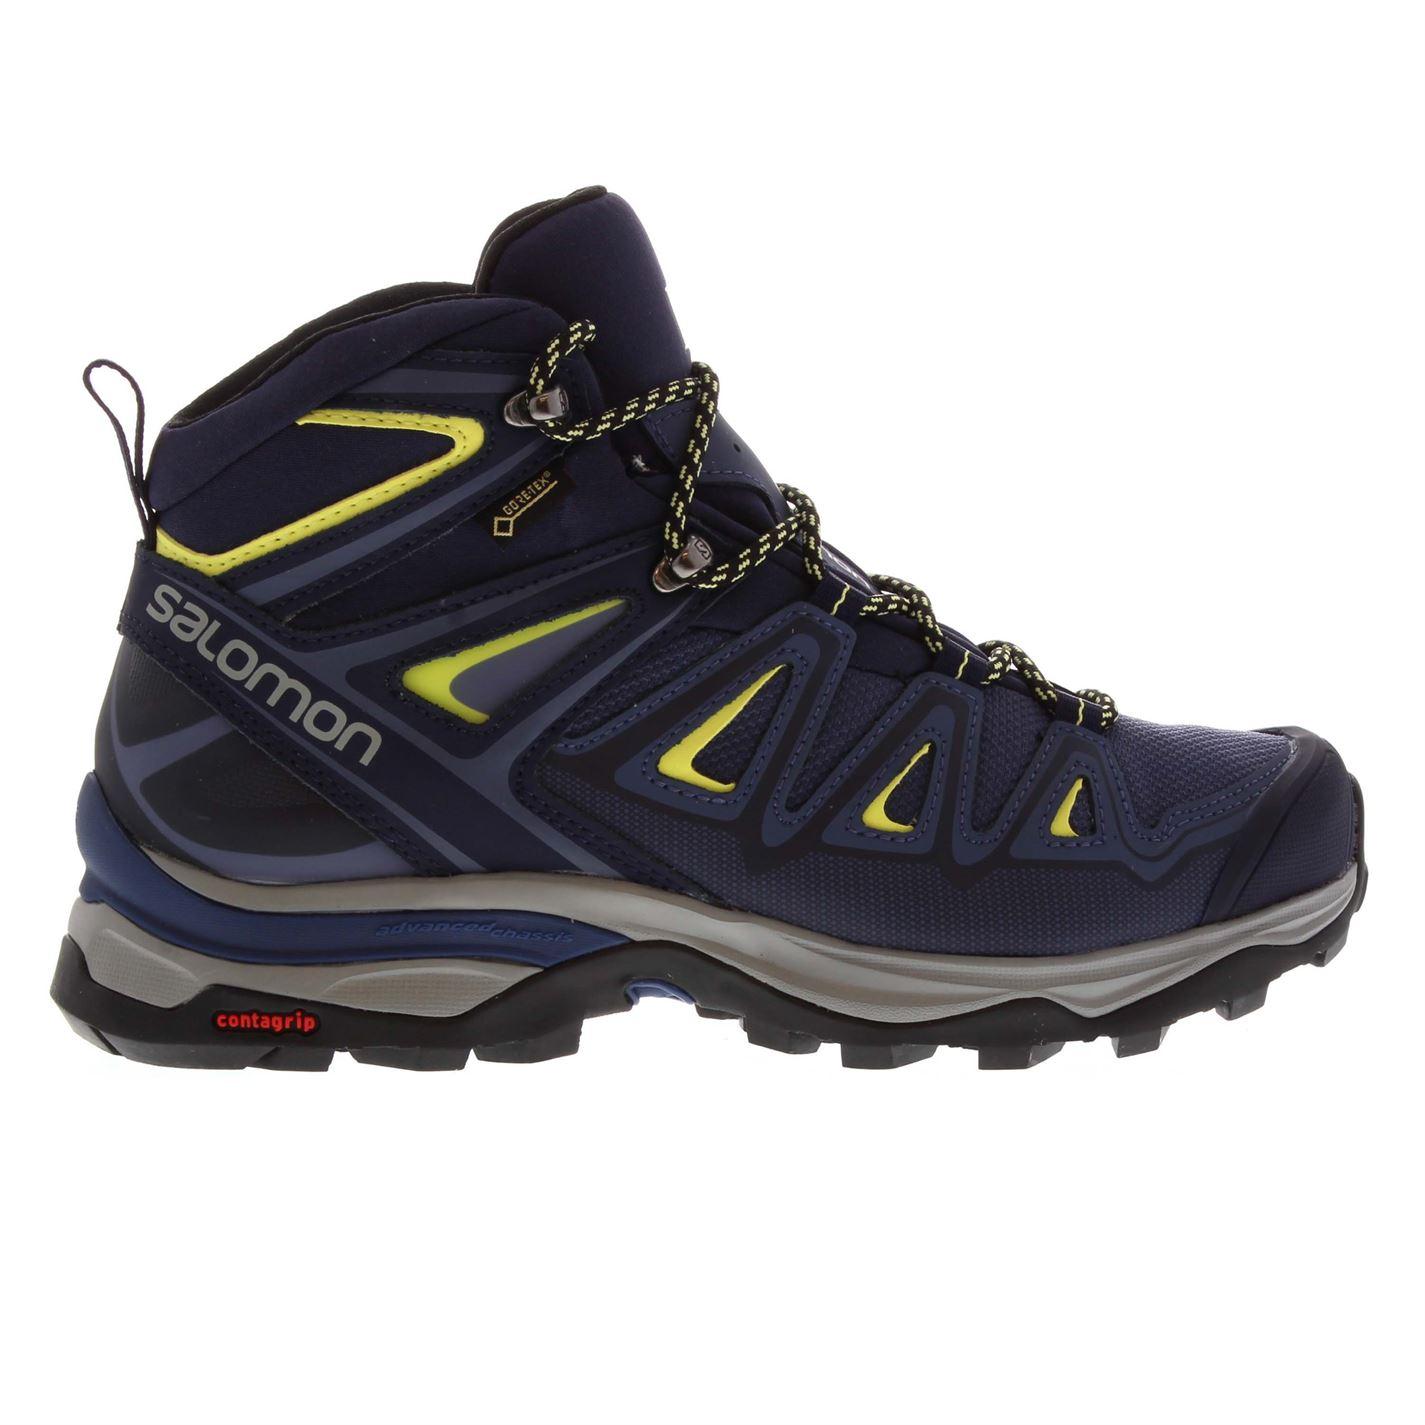 Salomon XUltra 3 Mid GTX Ladies Walking Shoes